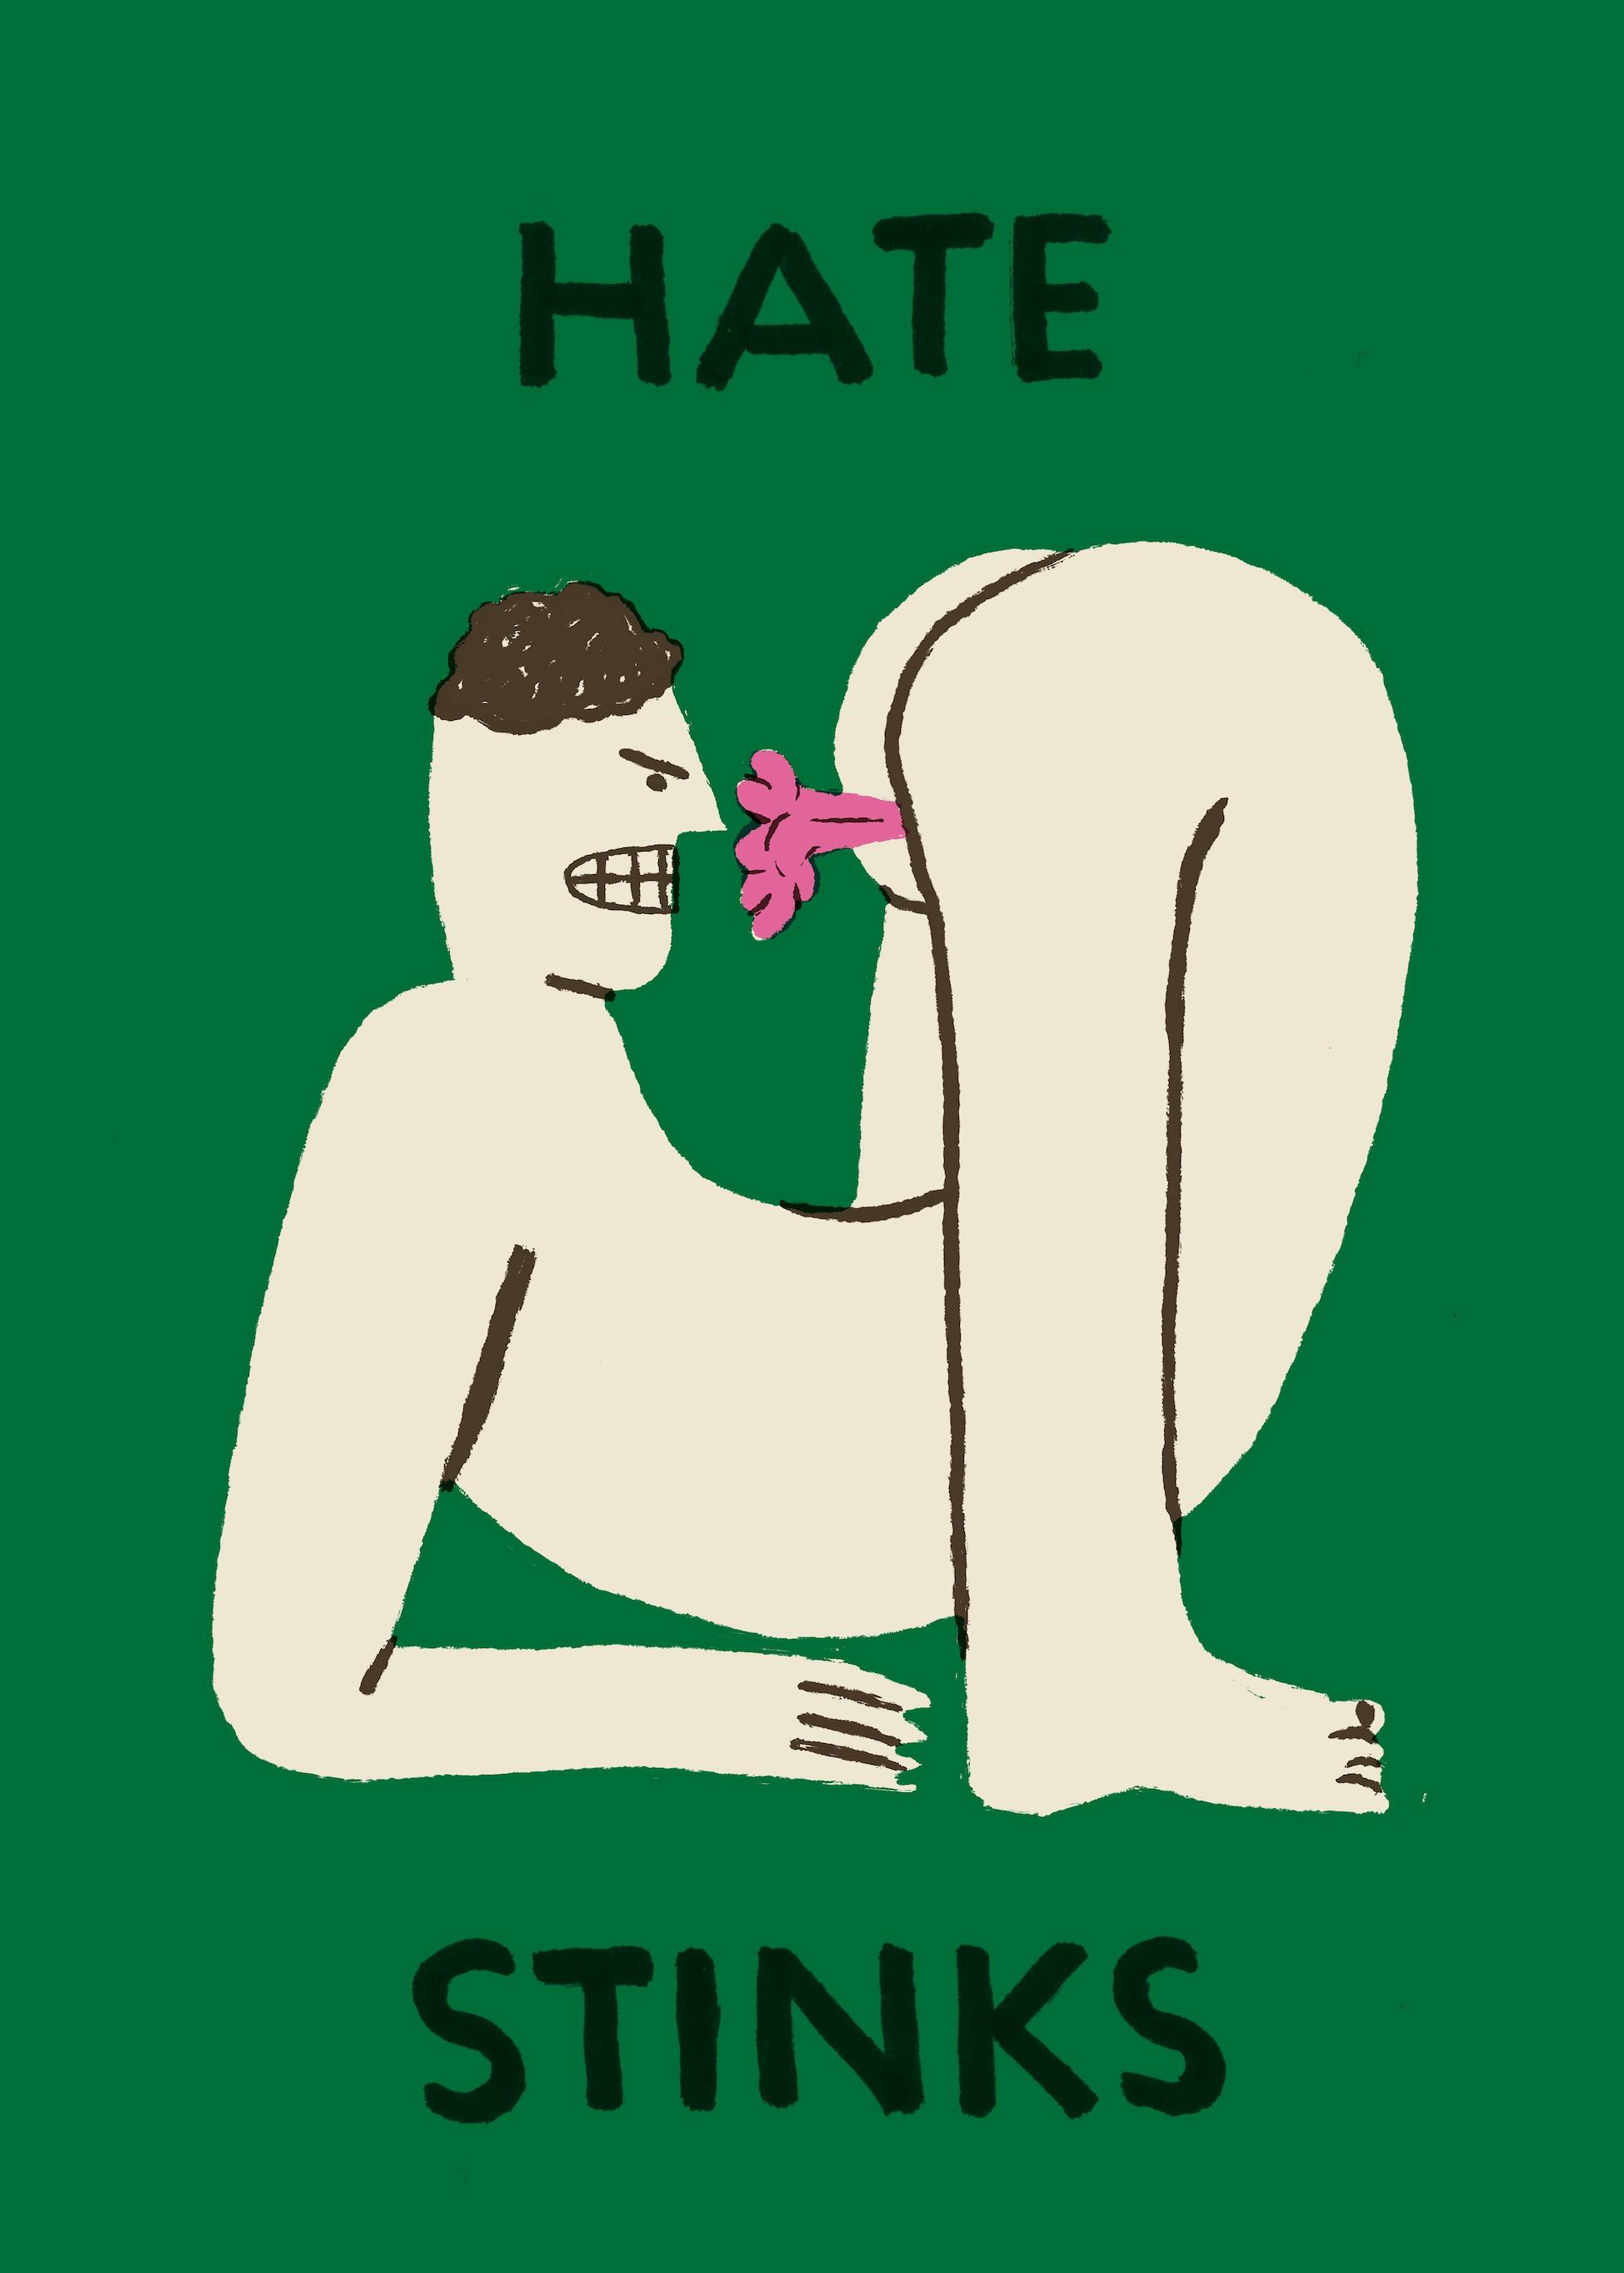 Hate Stinks (series 1/2) main image